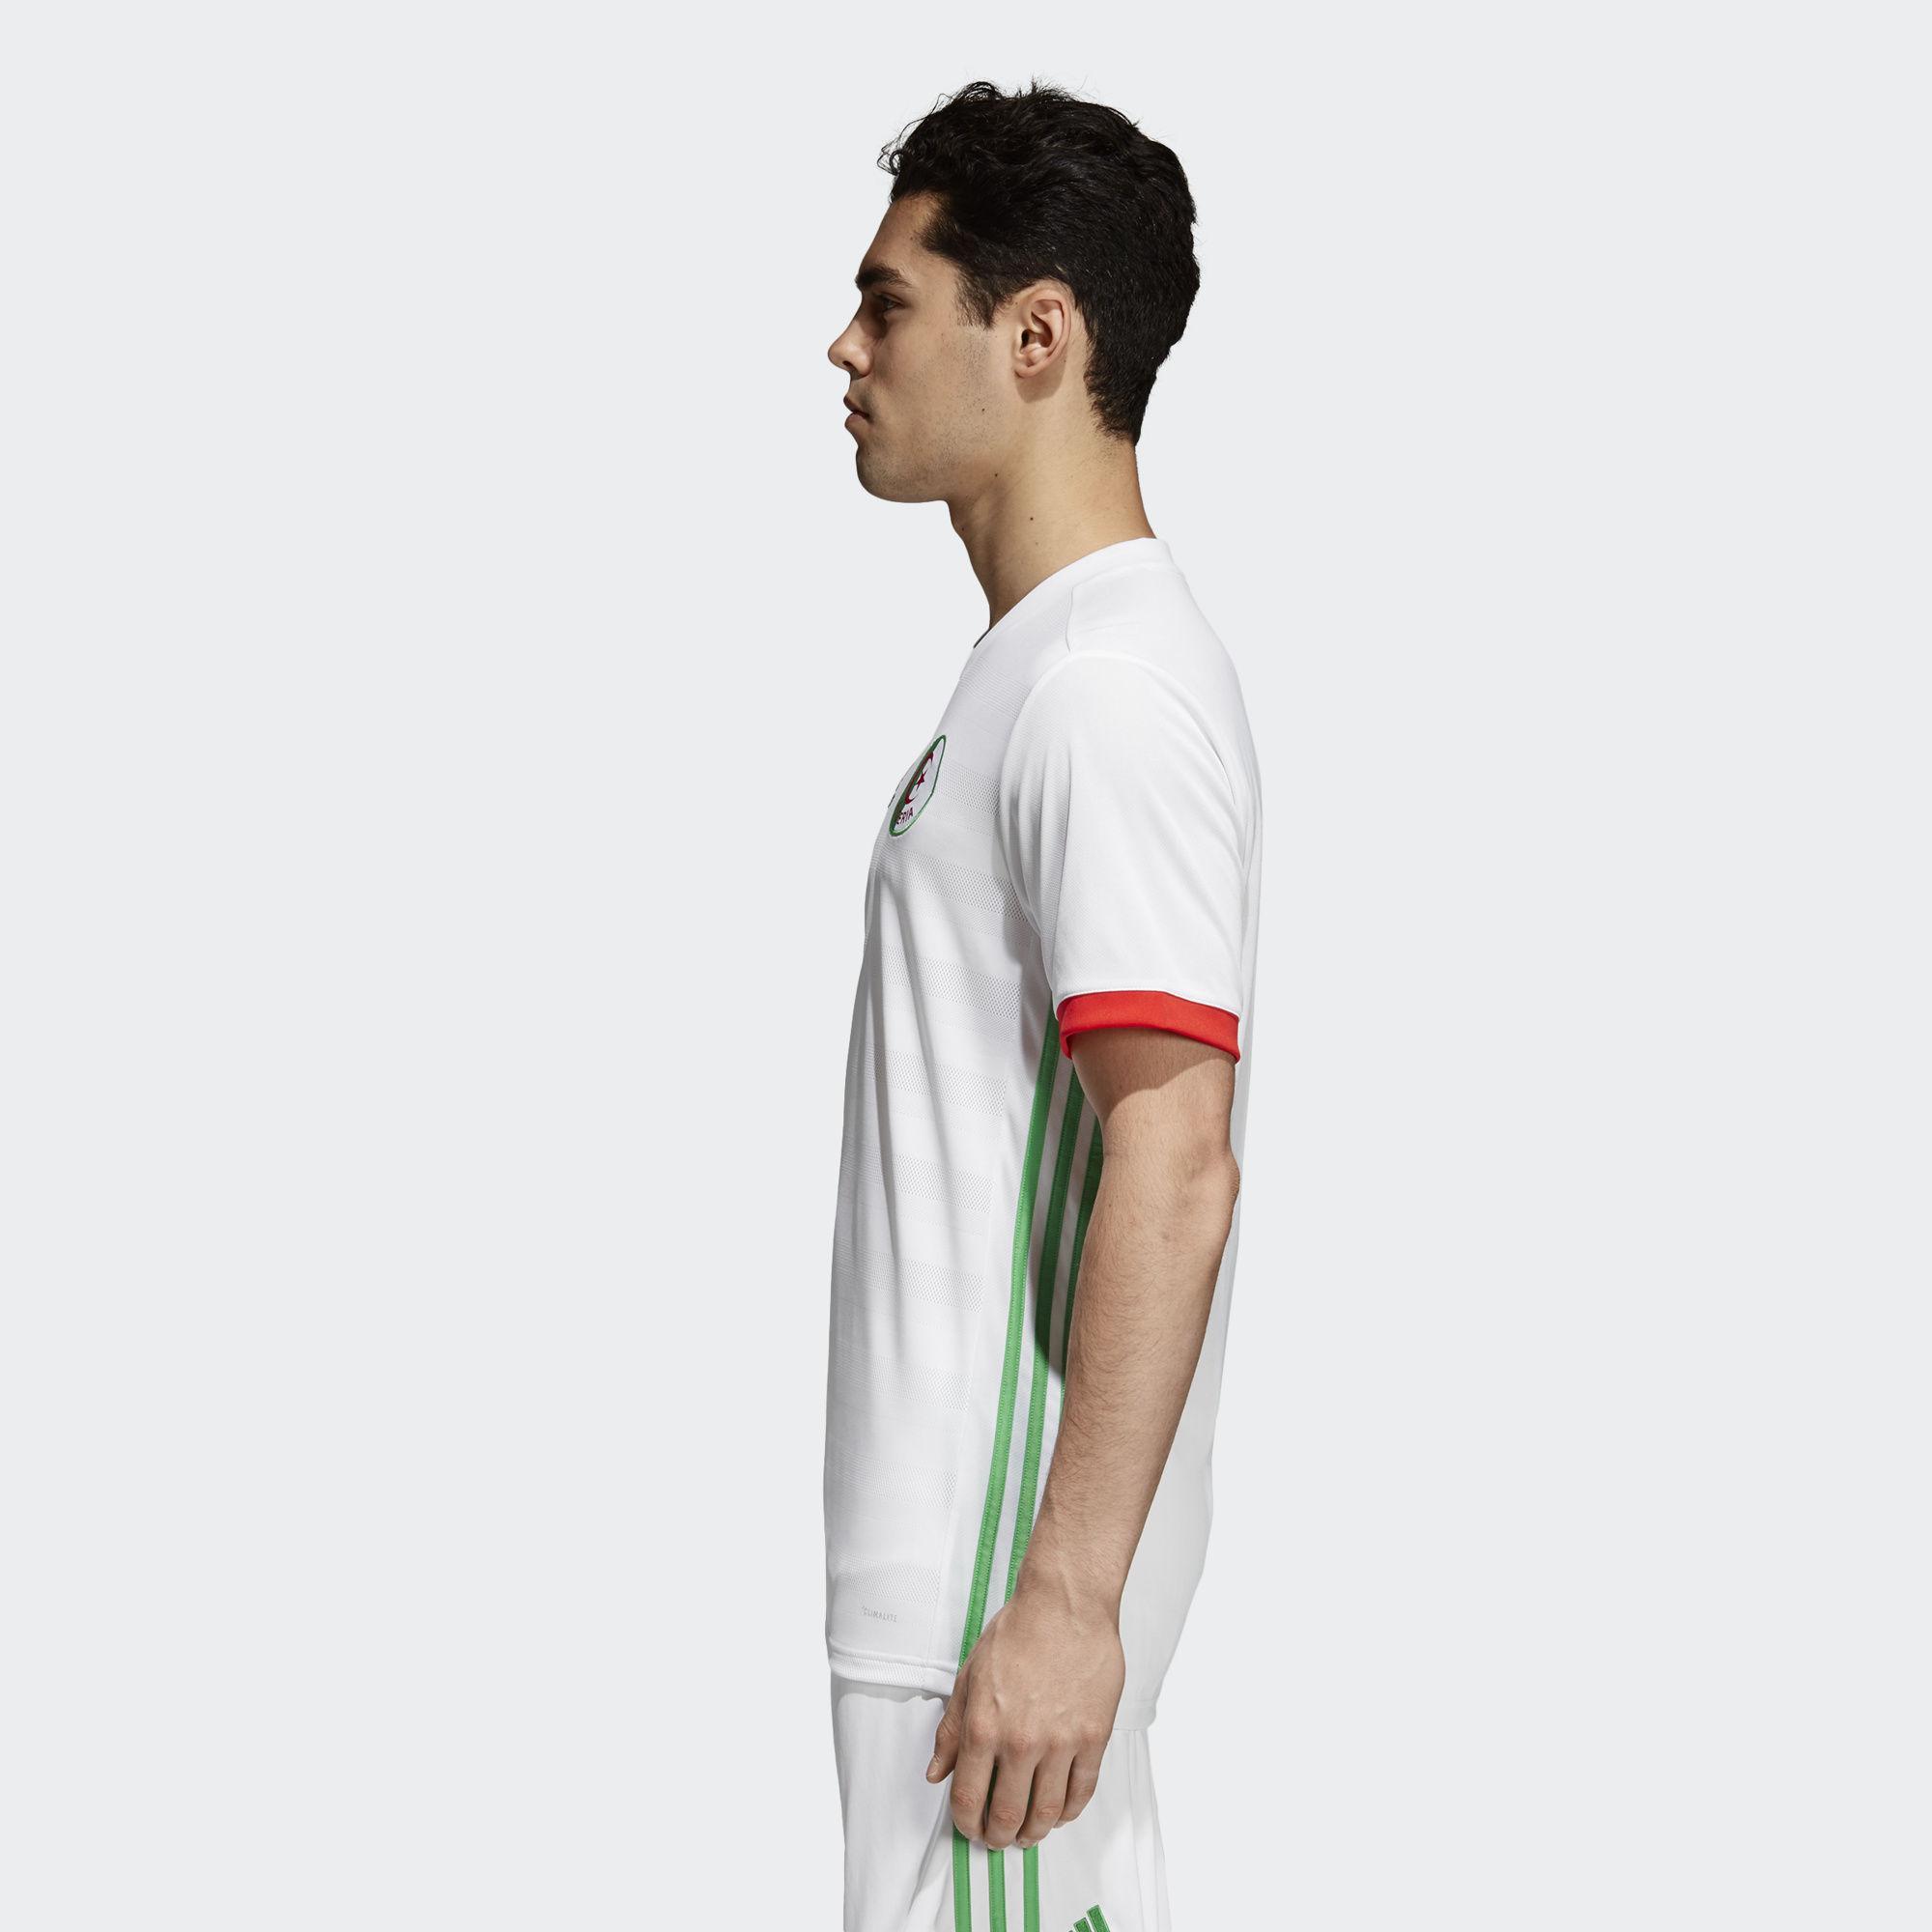 fbf2405e3 Adidas - White Algeria Home Jersey for Men - Lyst. View fullscreen